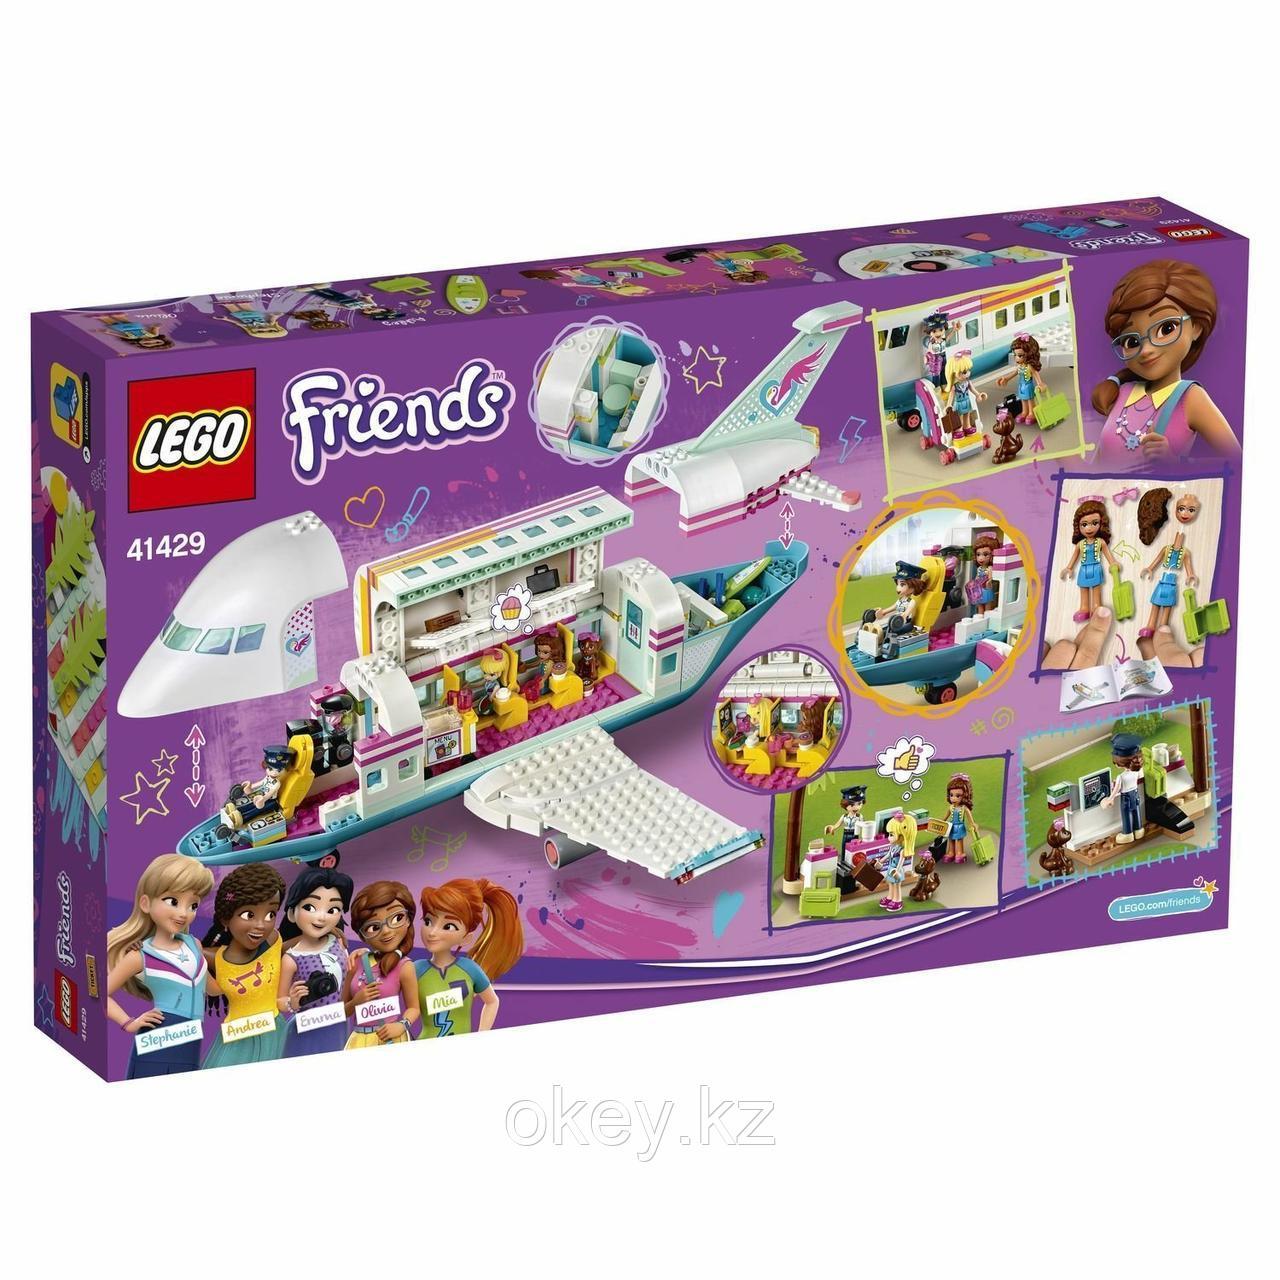 LEGO Friends: Самолёт в Хартлейк Сити 41429 - фото 3